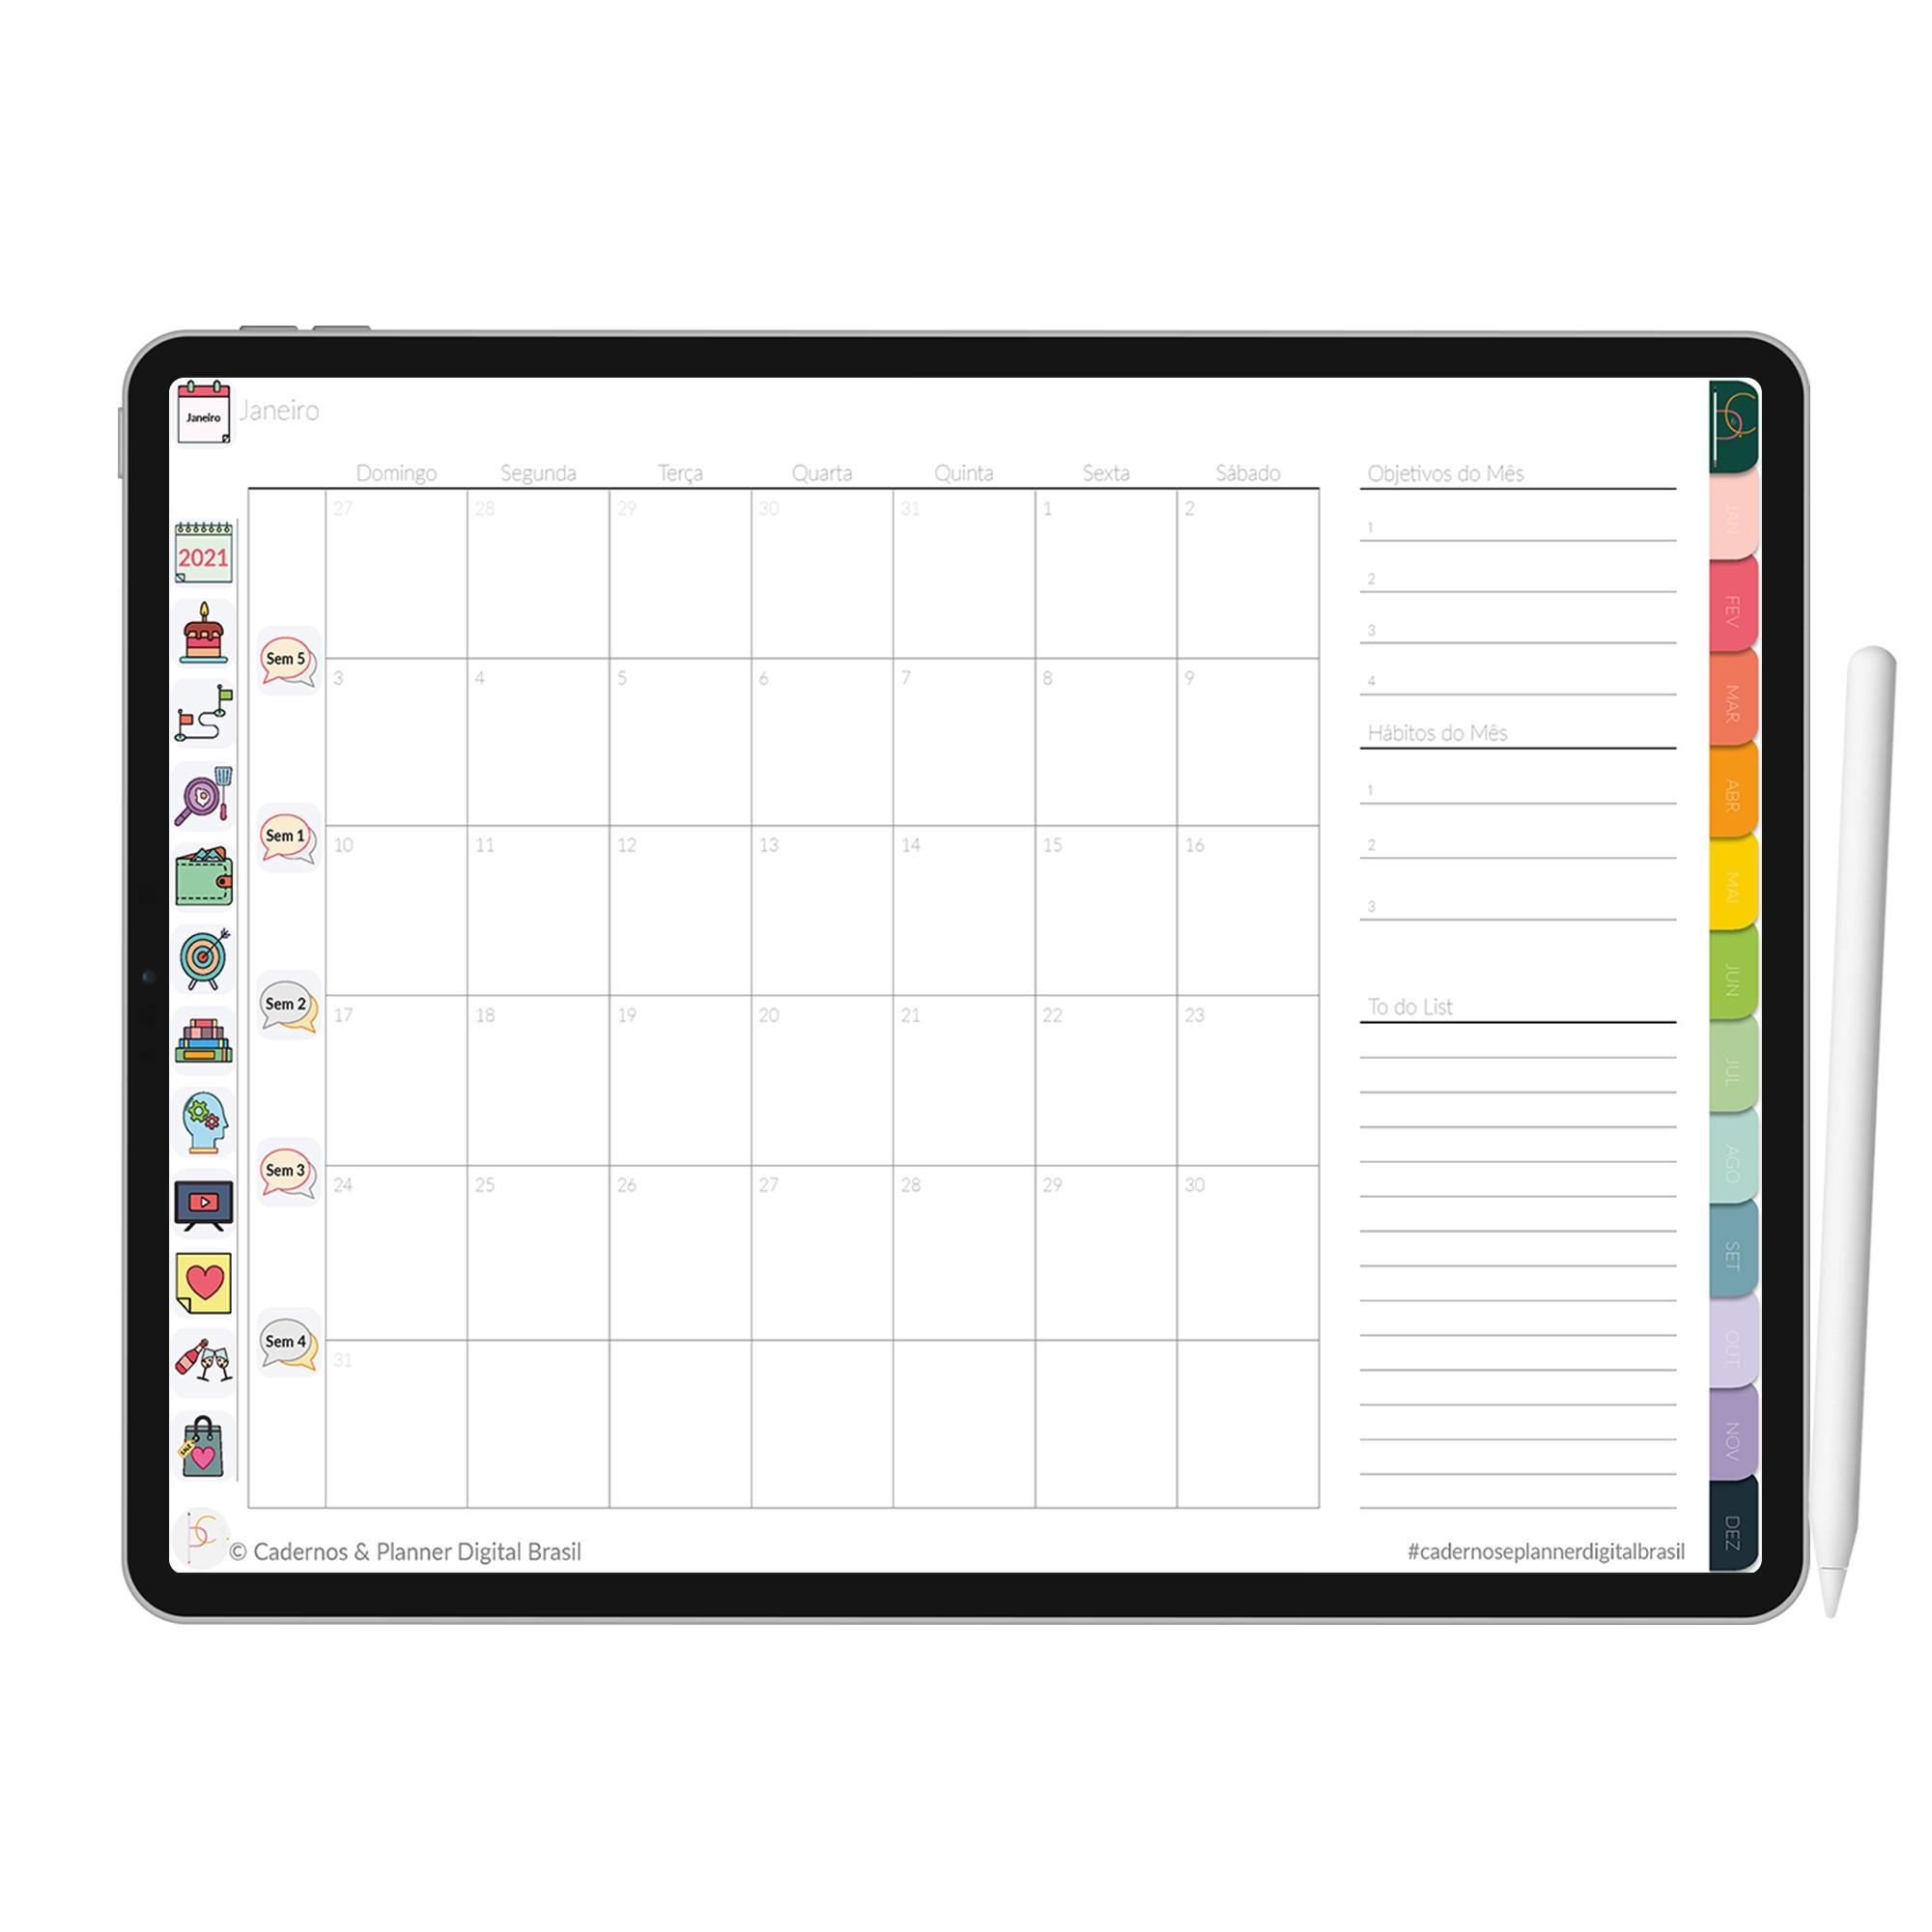 Planner Digital Anual, Mensal, Semanal, Diário   iPad Tablet   Download Instantâneo